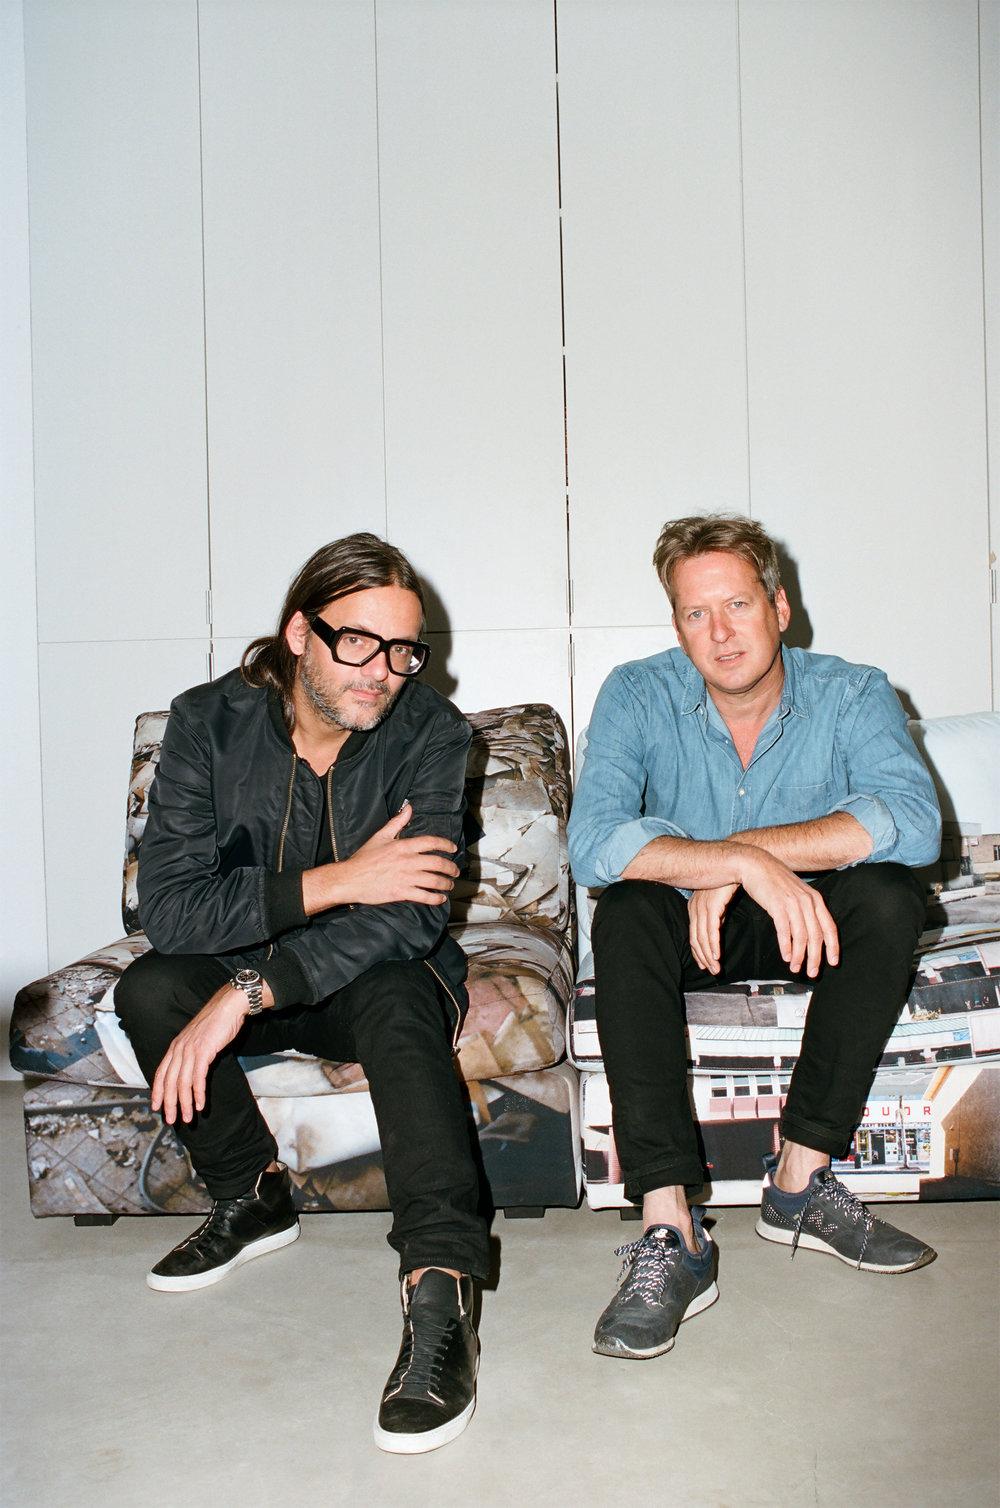 Doug Aitken & Cyrill Gutsch / Parley for the Oceans Project